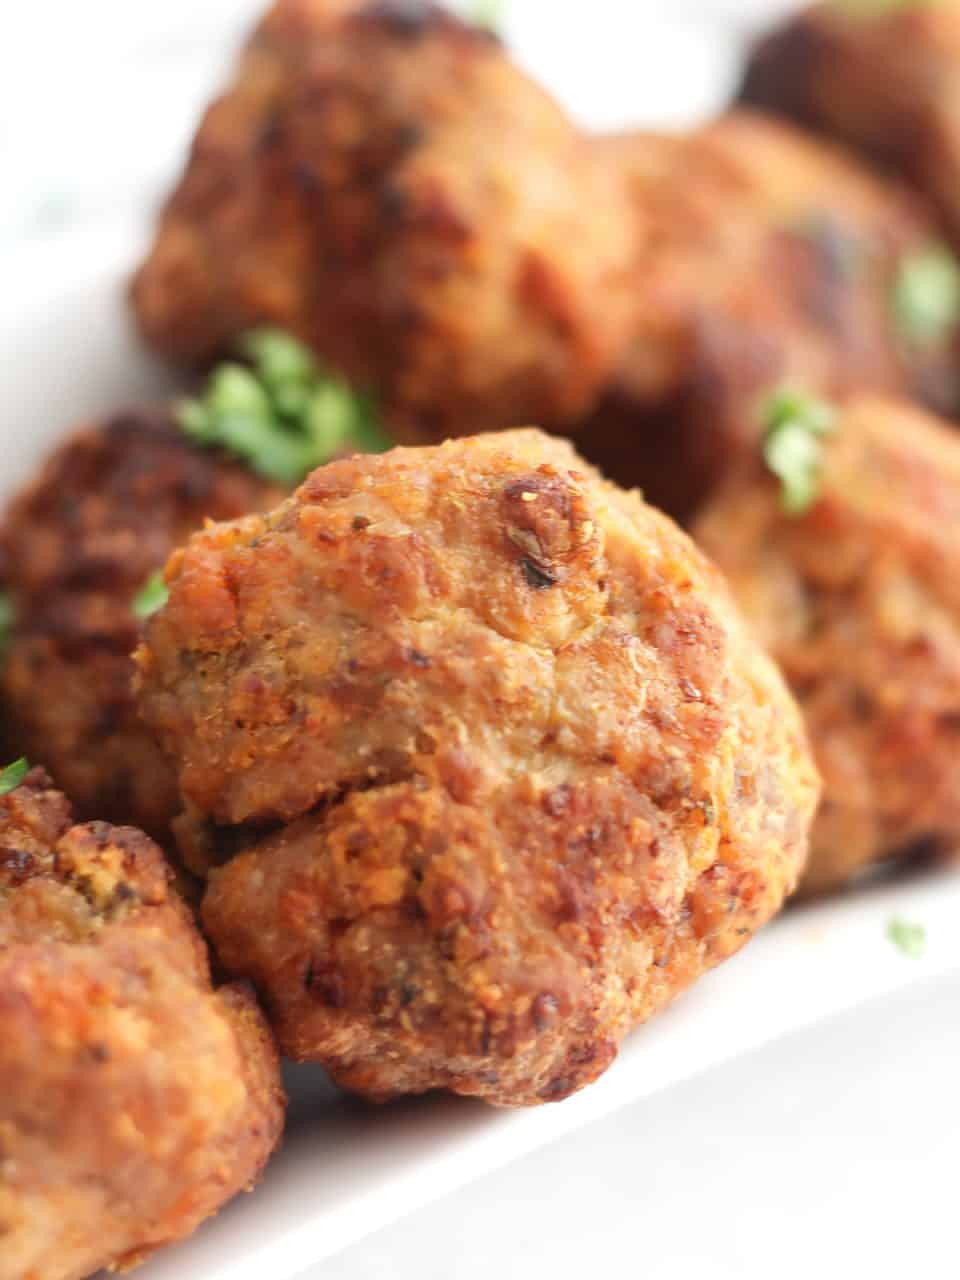 Close up of an air fried turkey meatball.